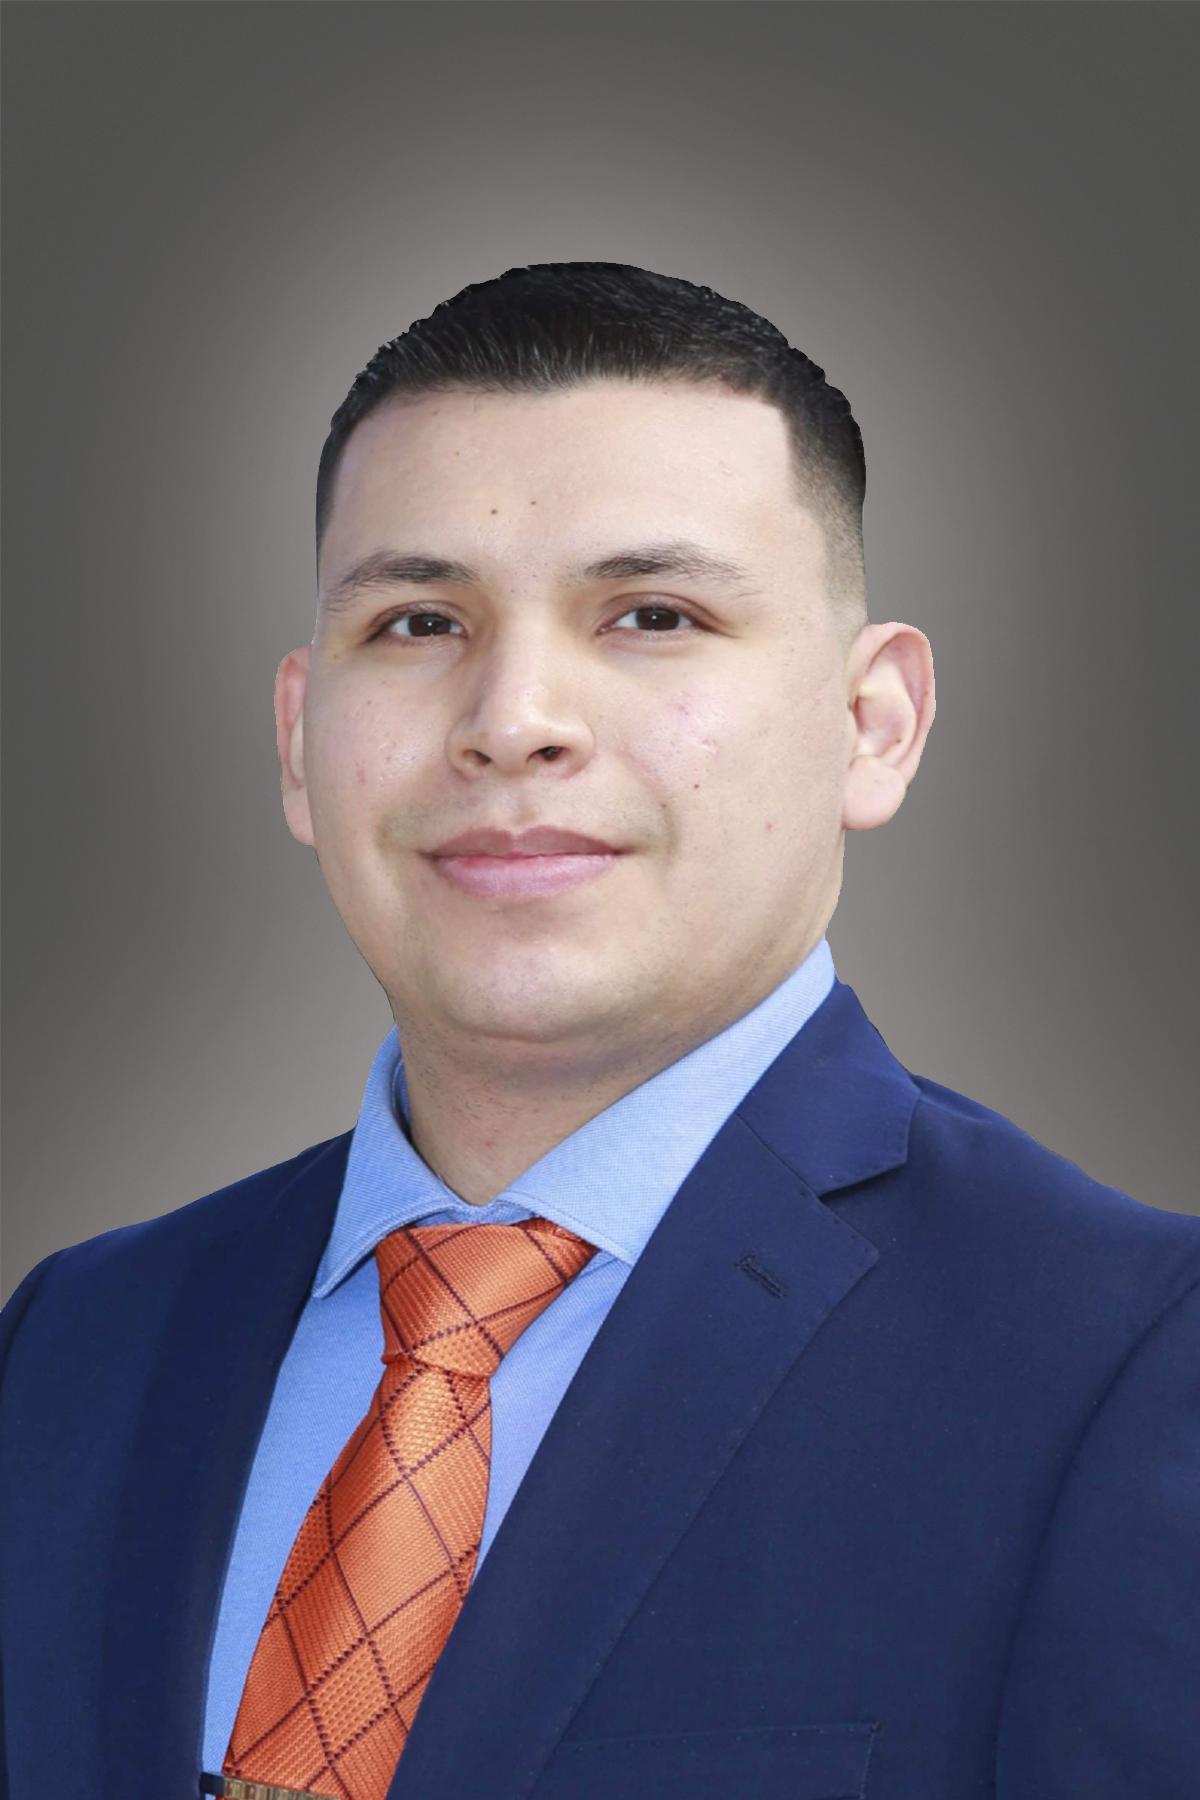 Jose Ontiveros, Pharmacy student